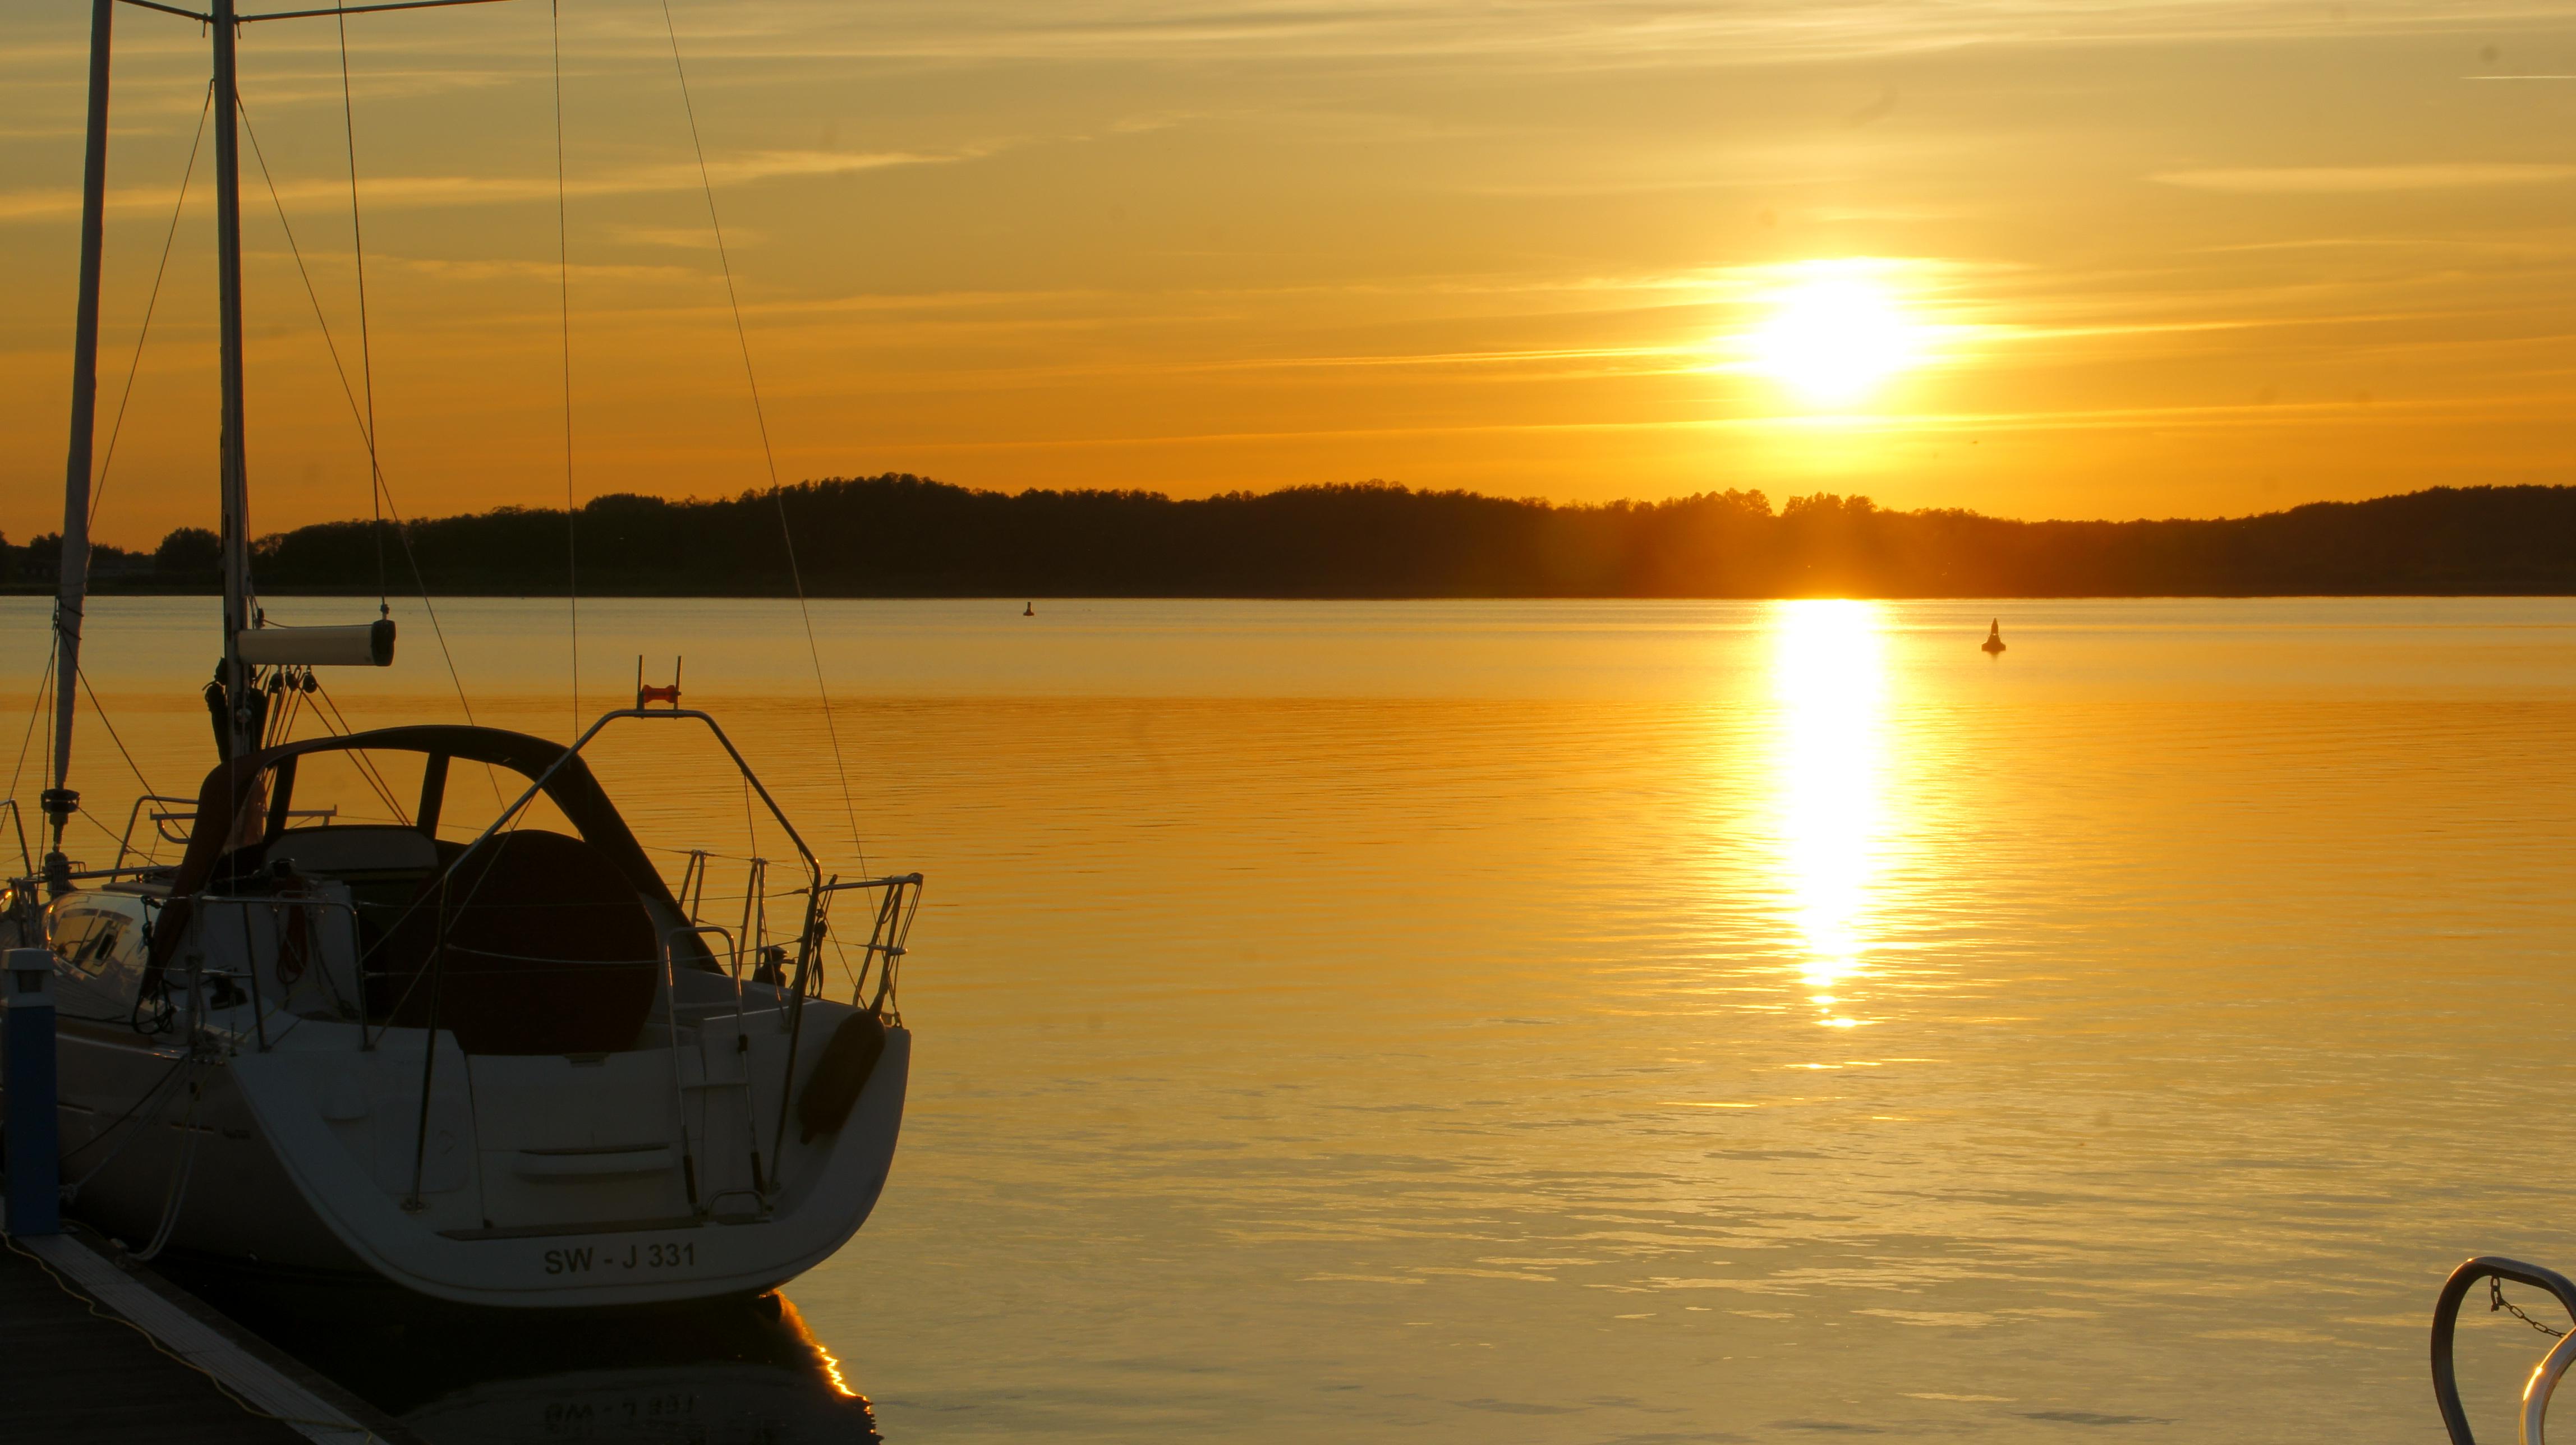 Heiligenhafen-Großenbrode (Mola Yachting)